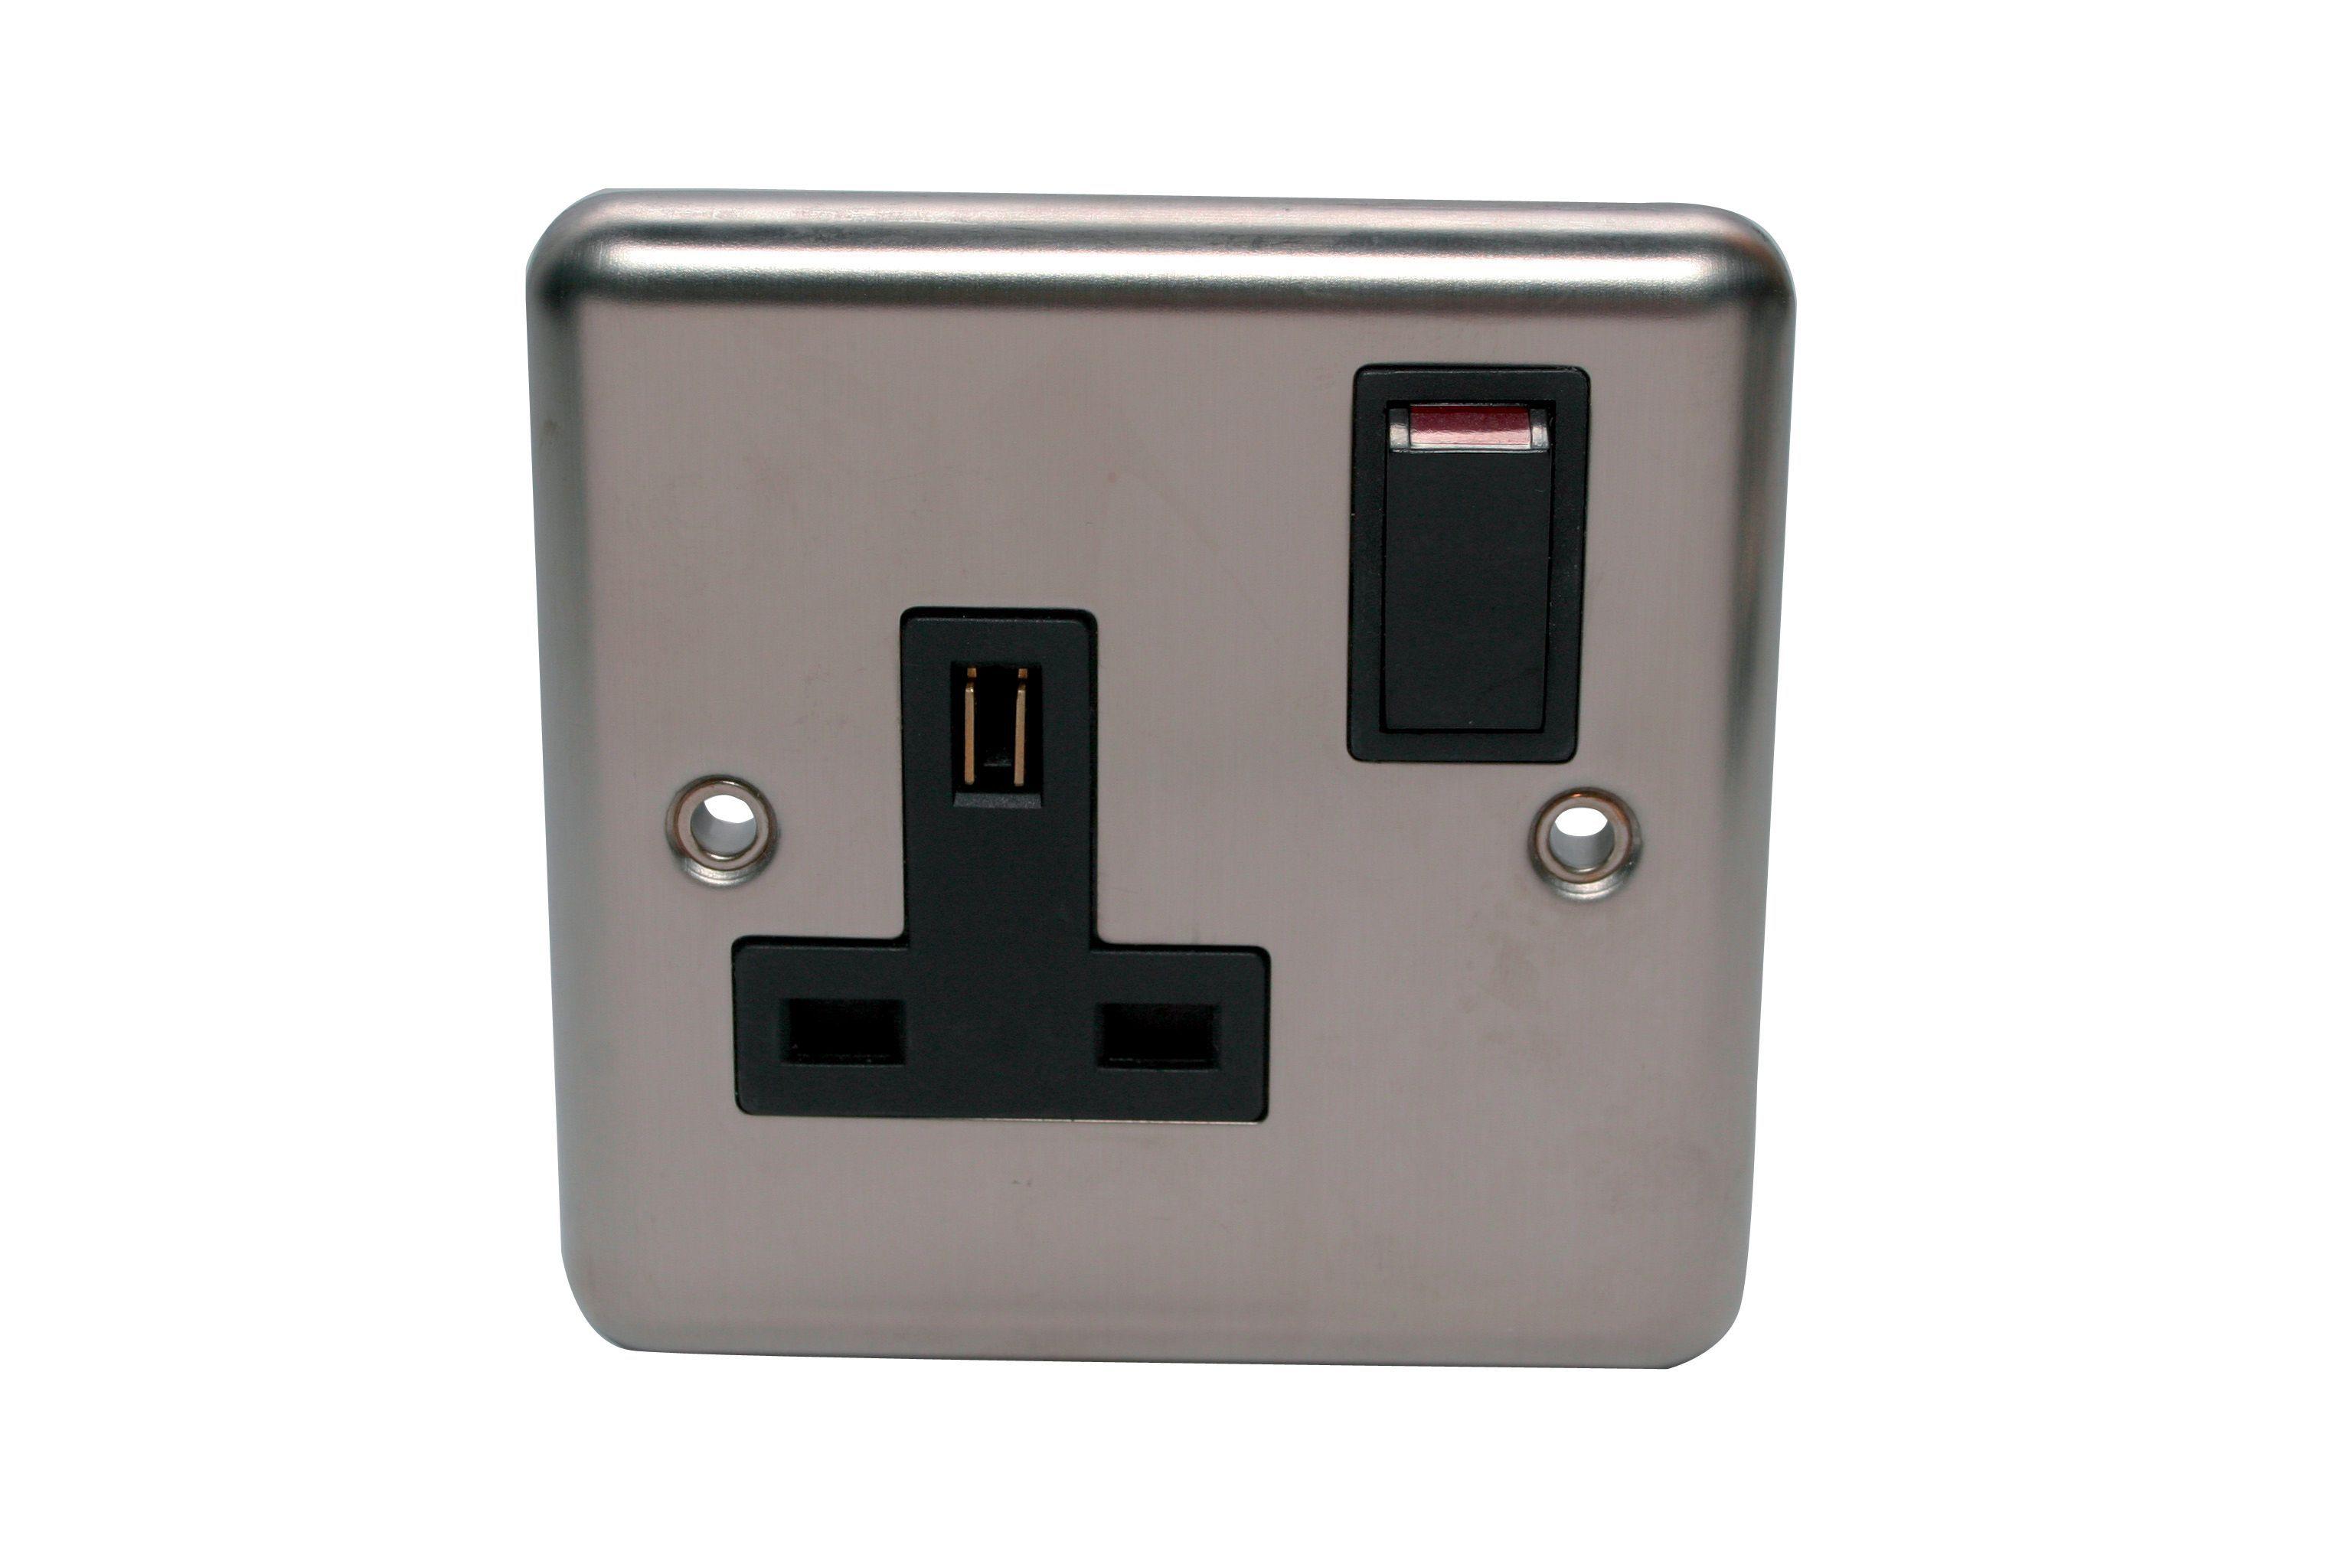 Volex 13a Polished Steel Switched Single Socket